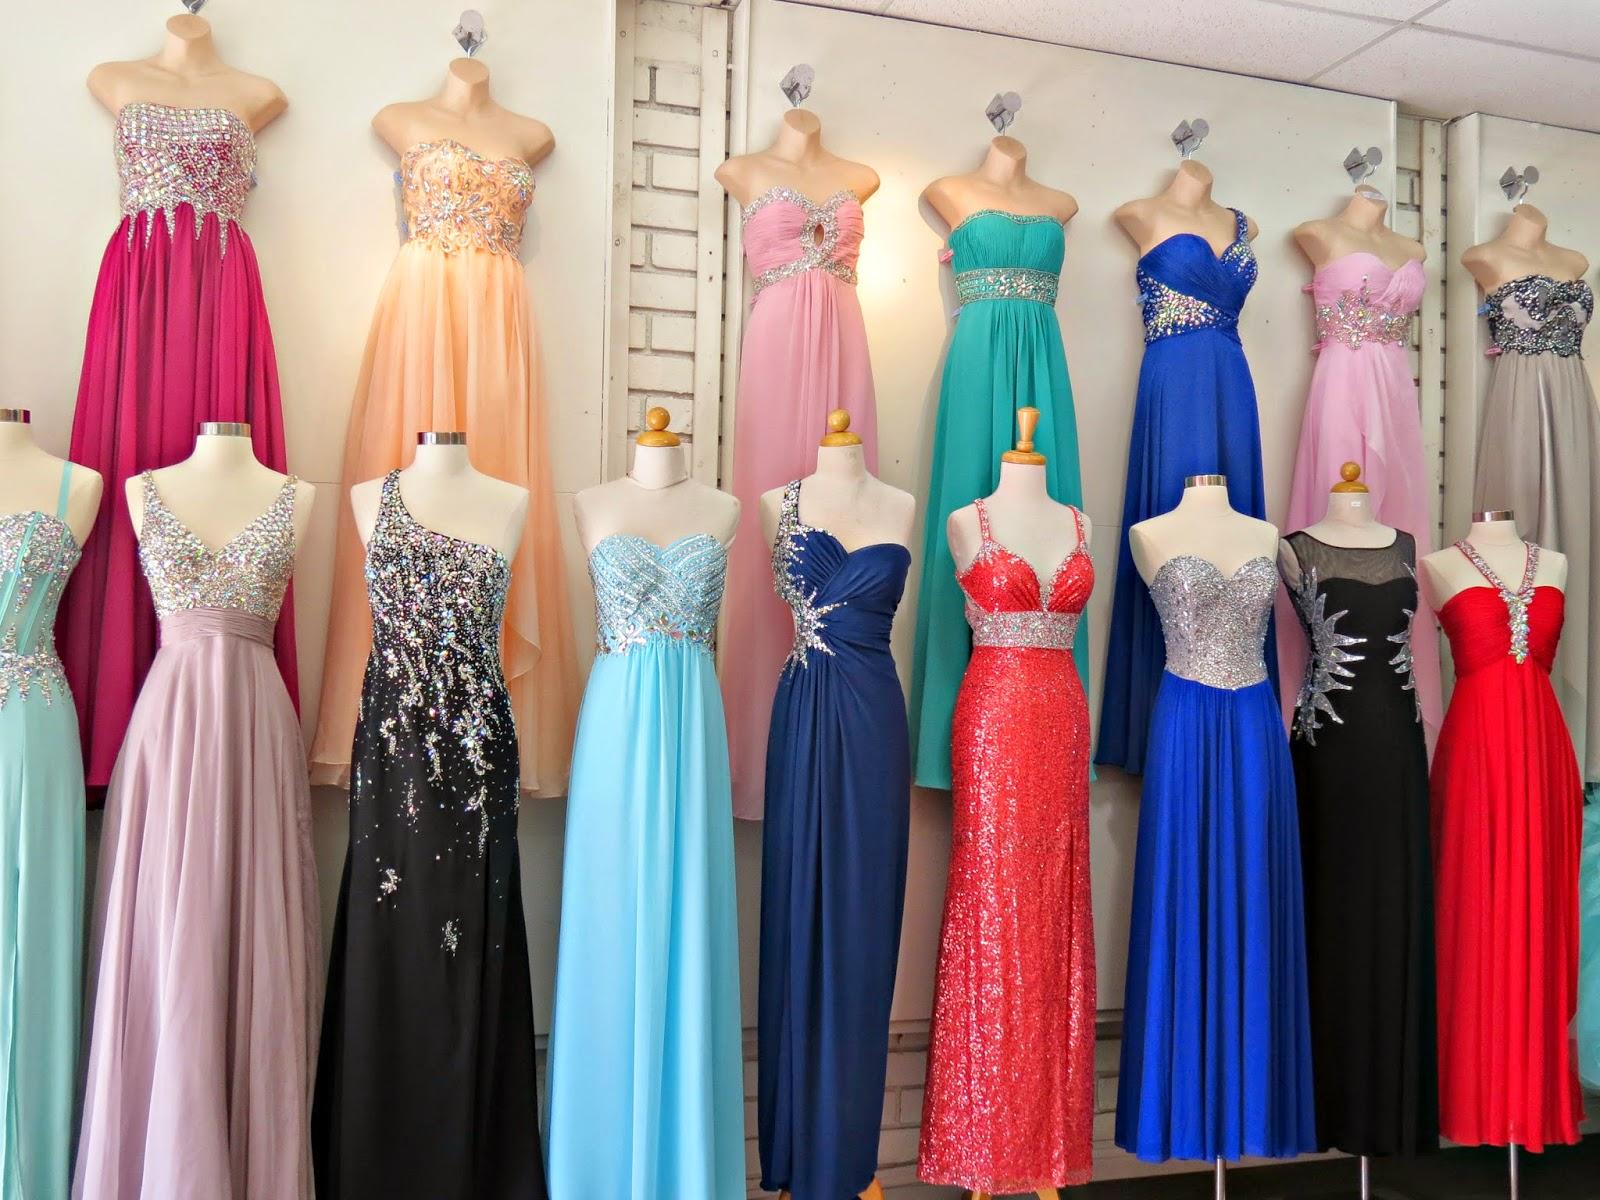 Dlugie sukienki na wesele (1)